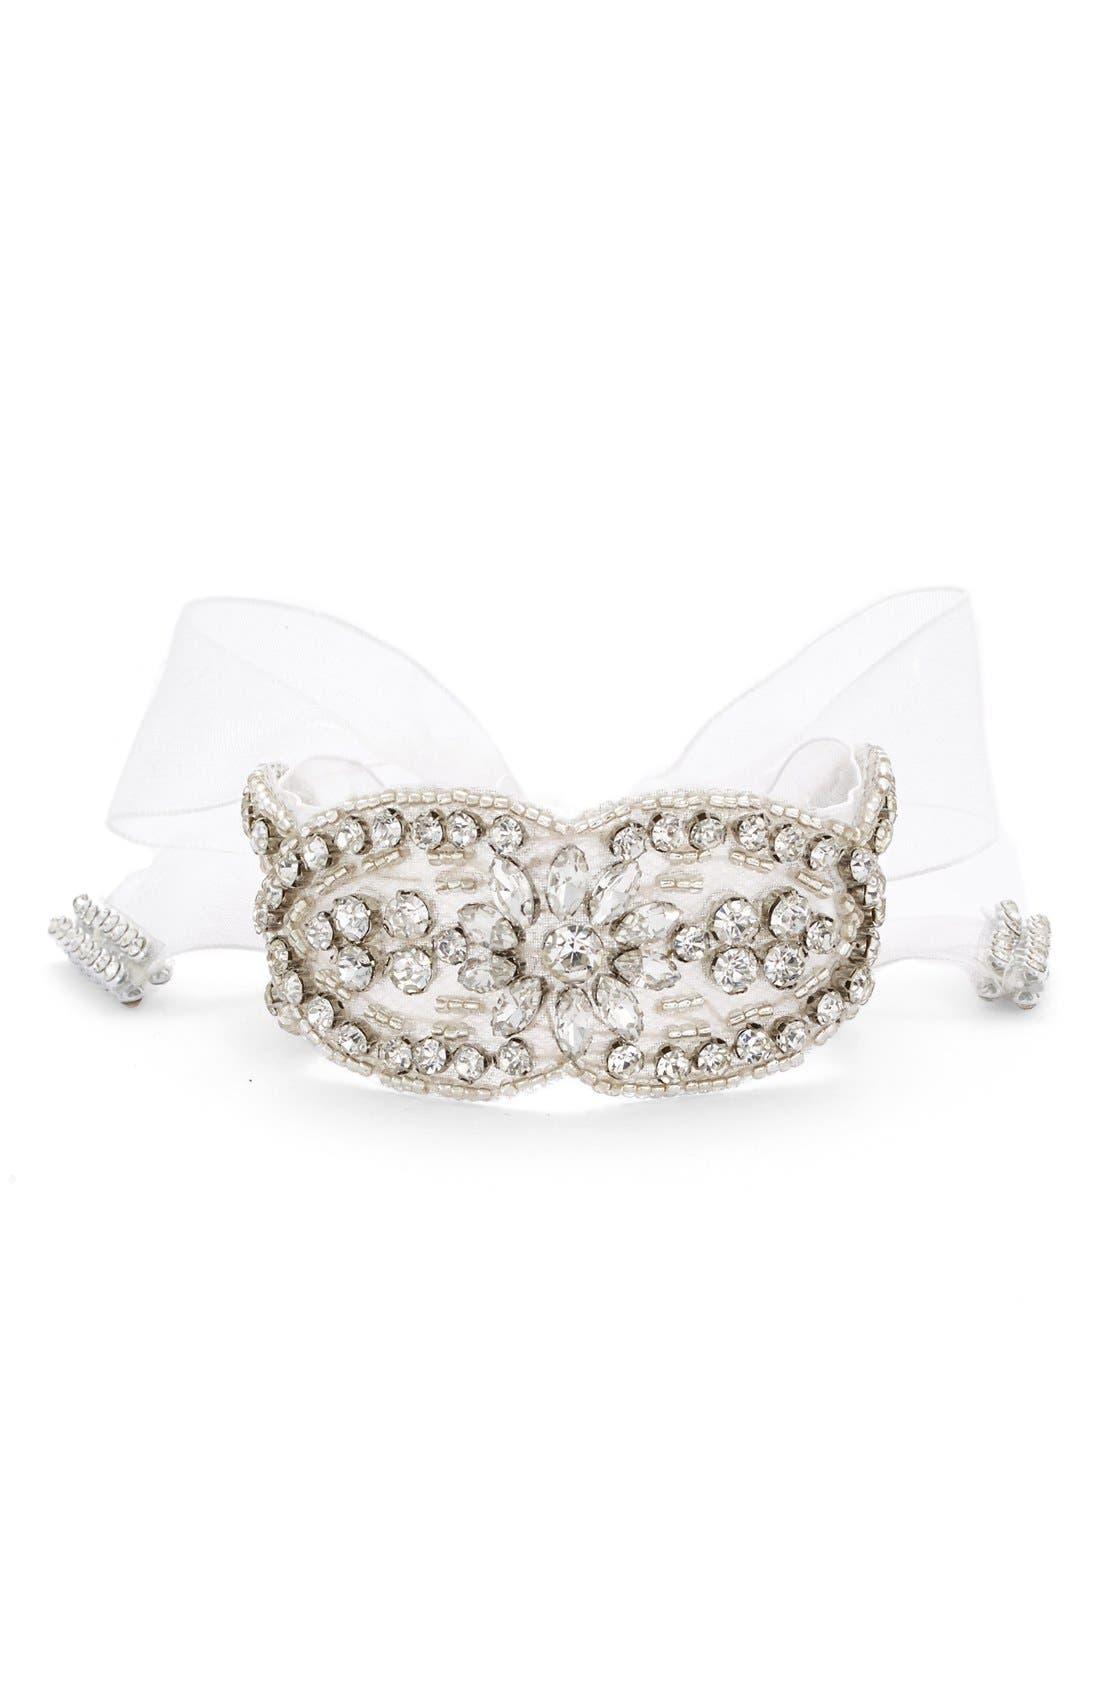 'Pretty Boho' Jewel Tie Bracelet,                             Main thumbnail 1, color,                             901